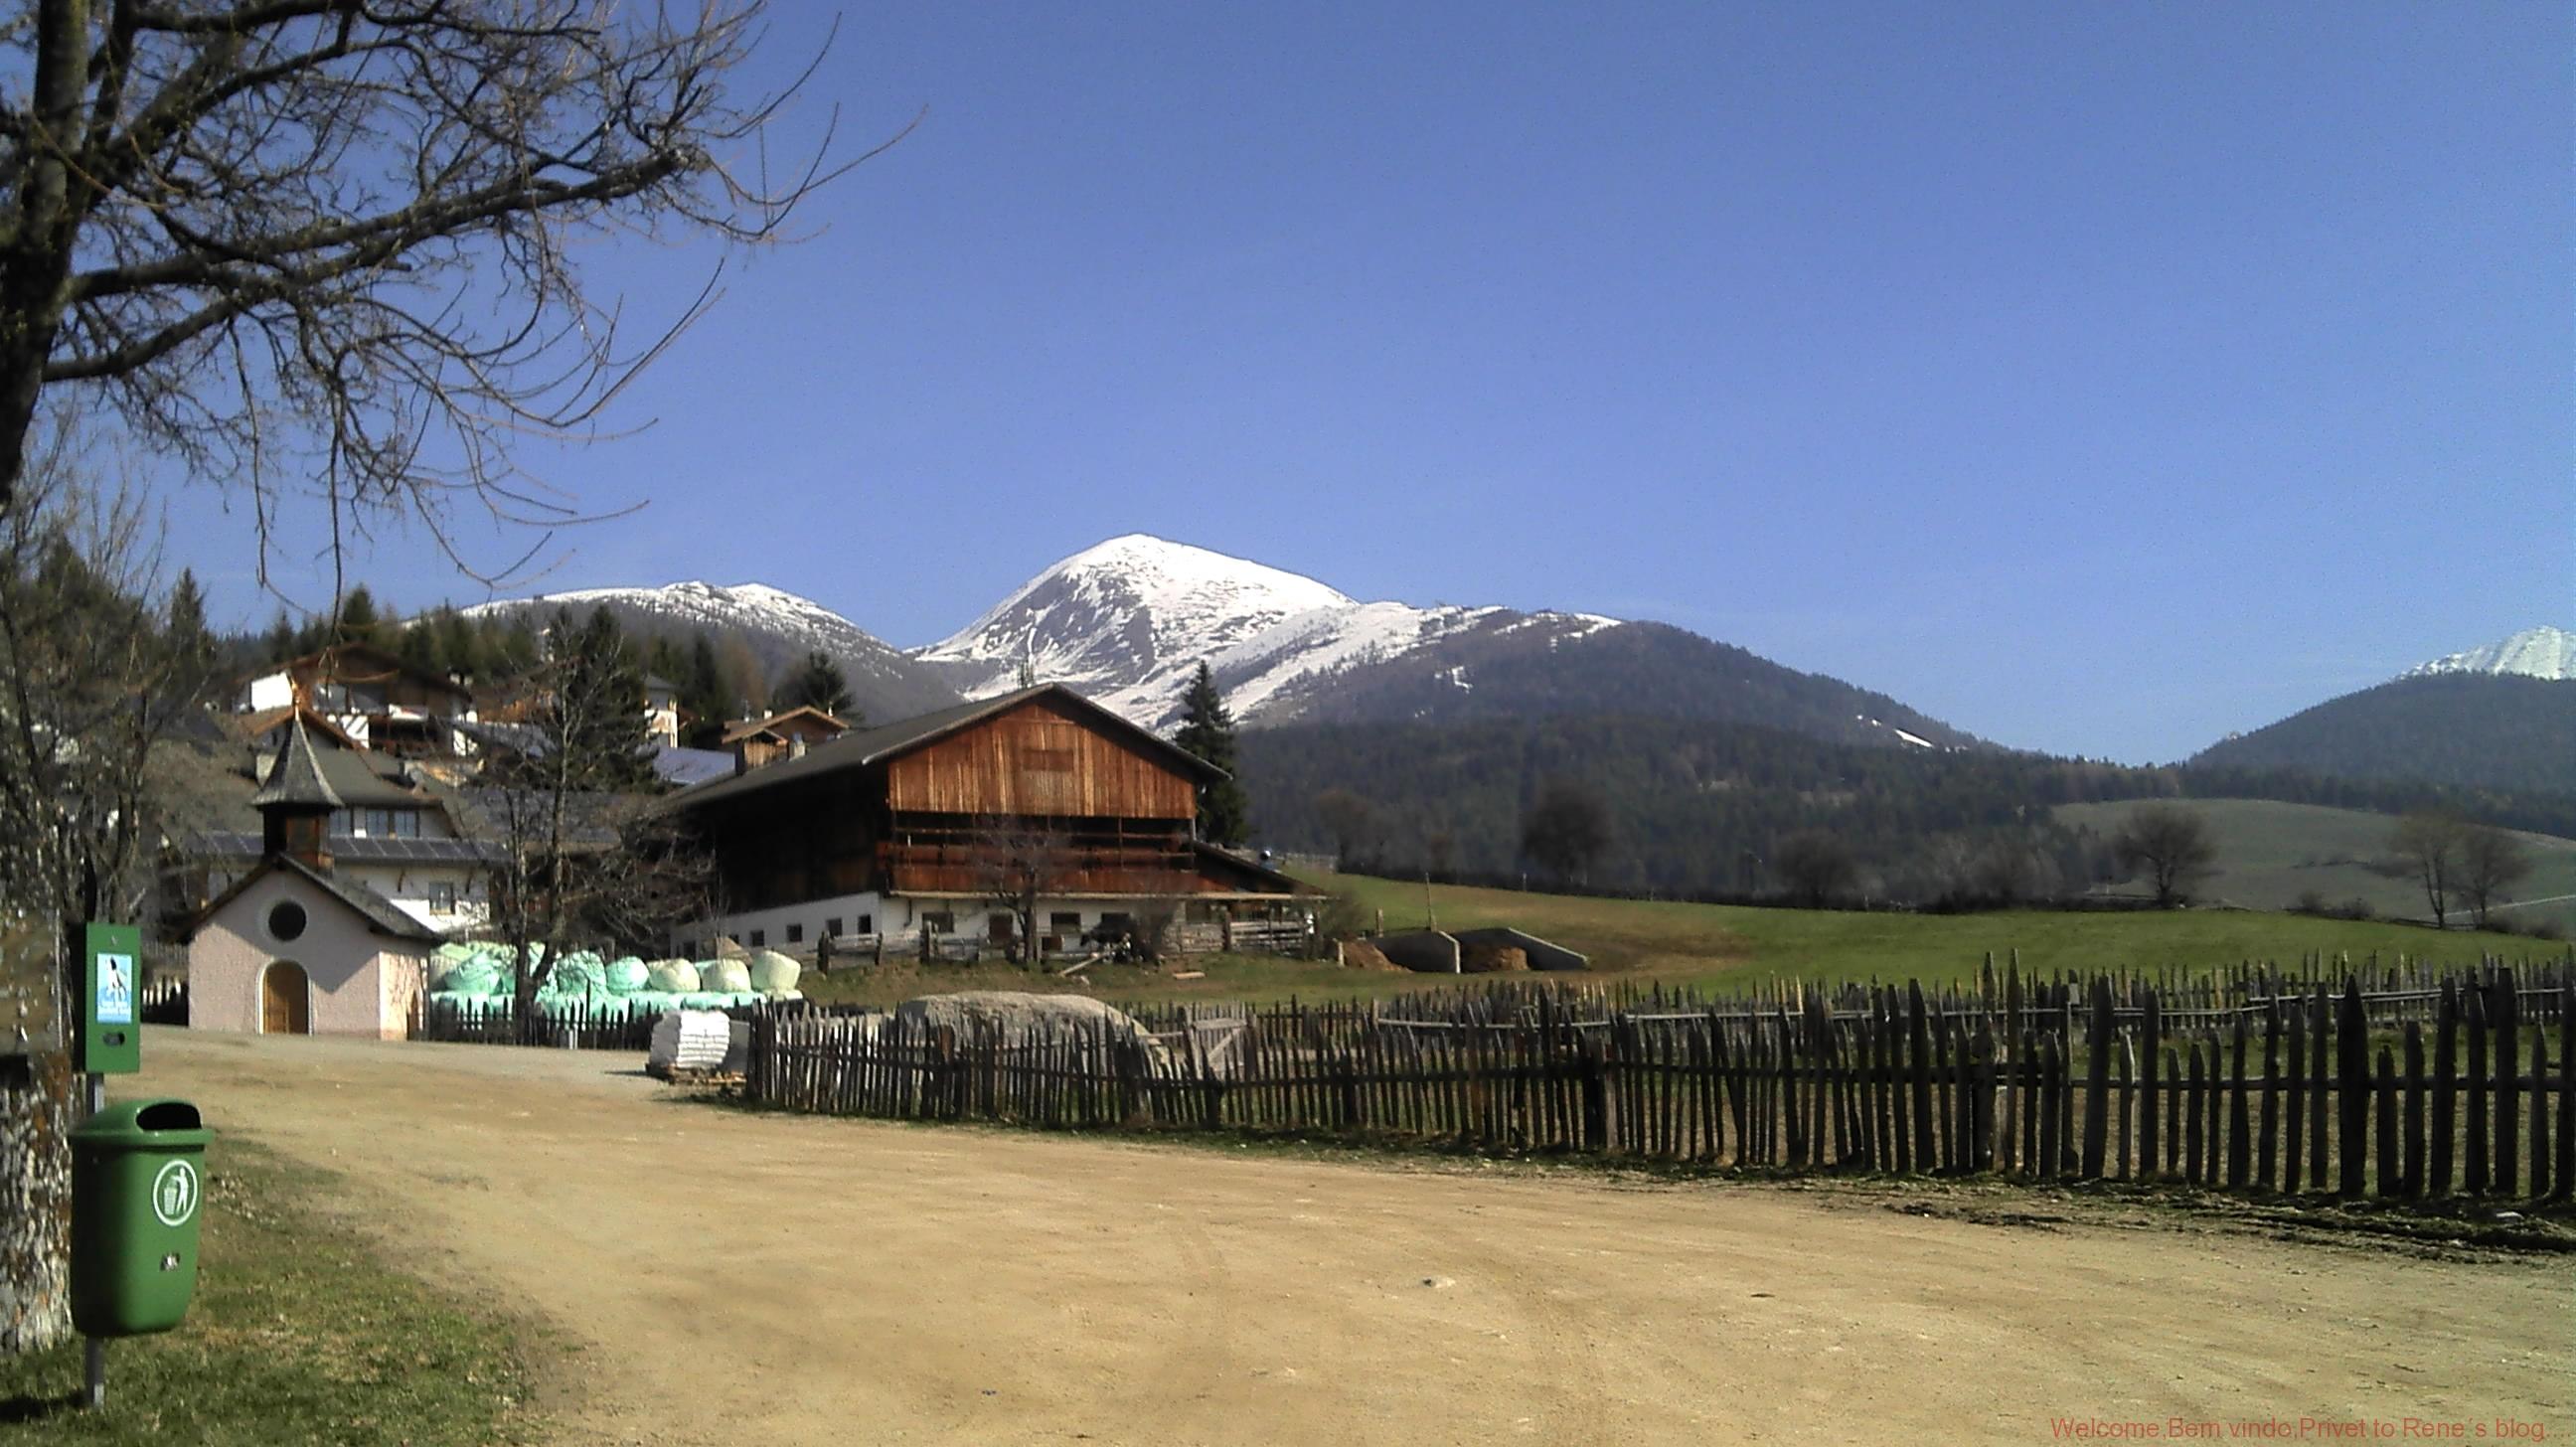 2011-04-03_10-54-45_649